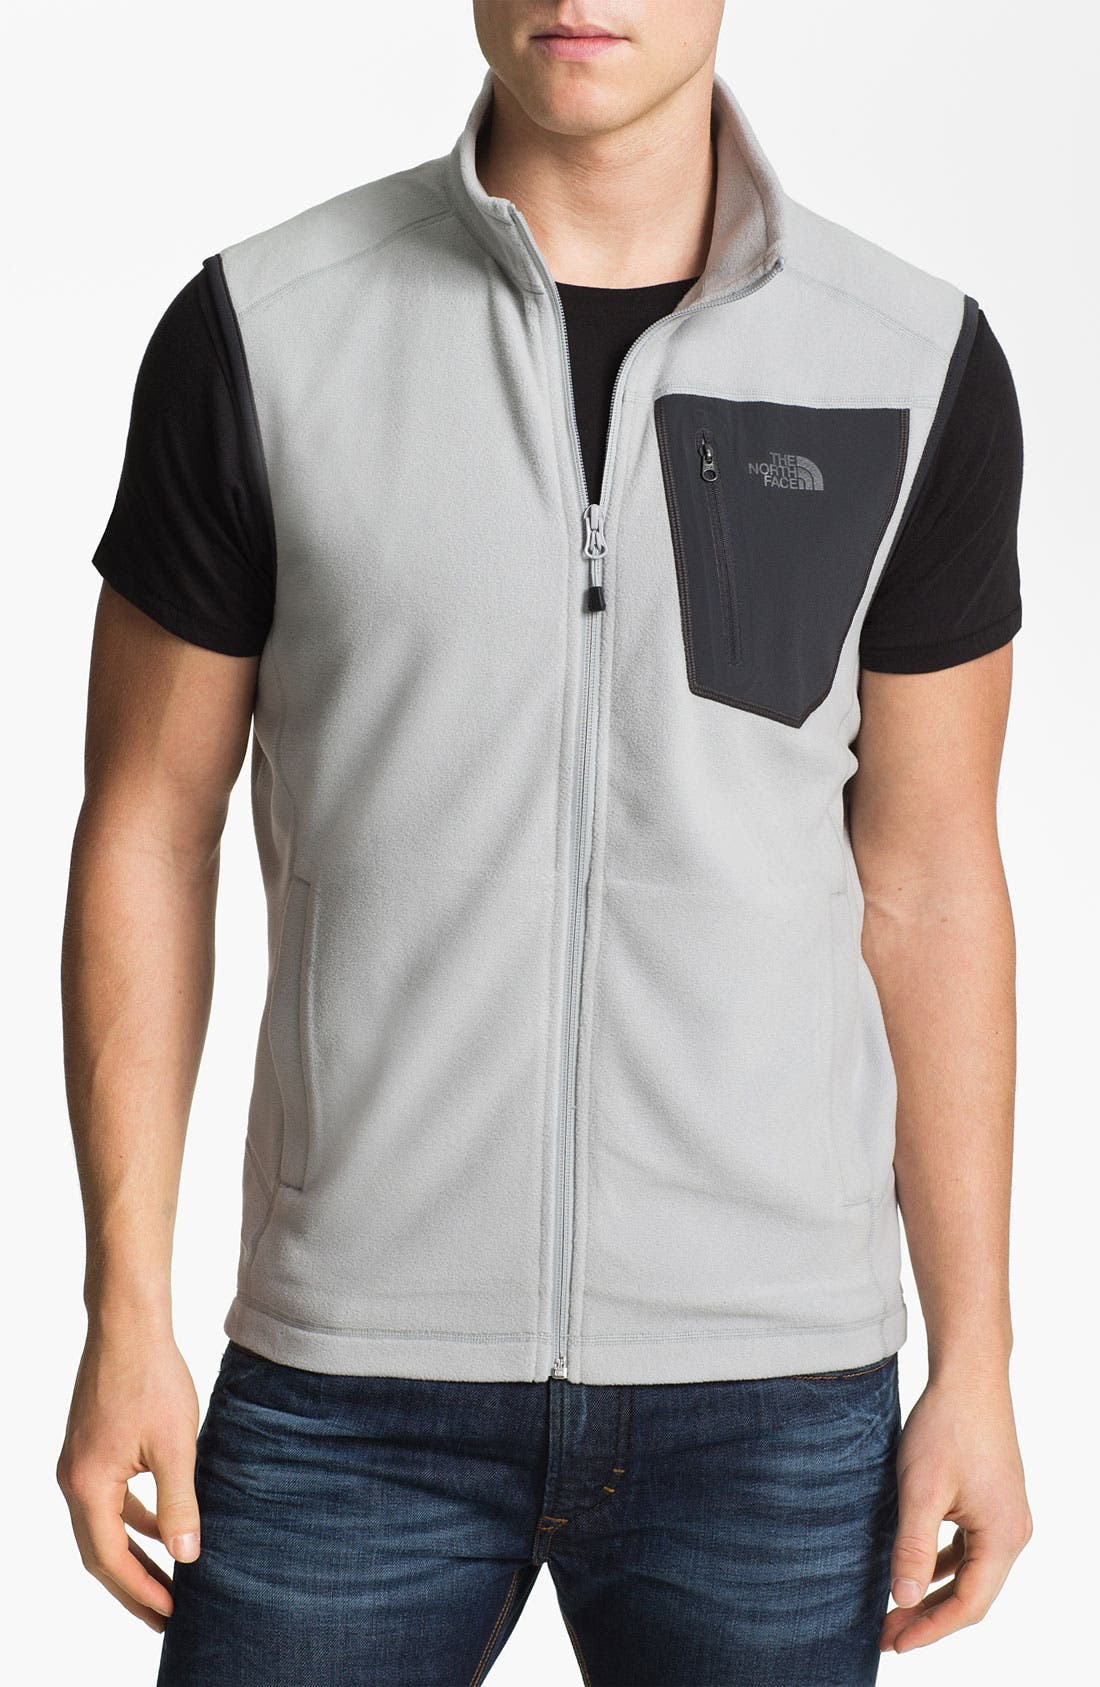 Main Image - The North Face 'TKA 100 Trinity Alps' Fleece Vest